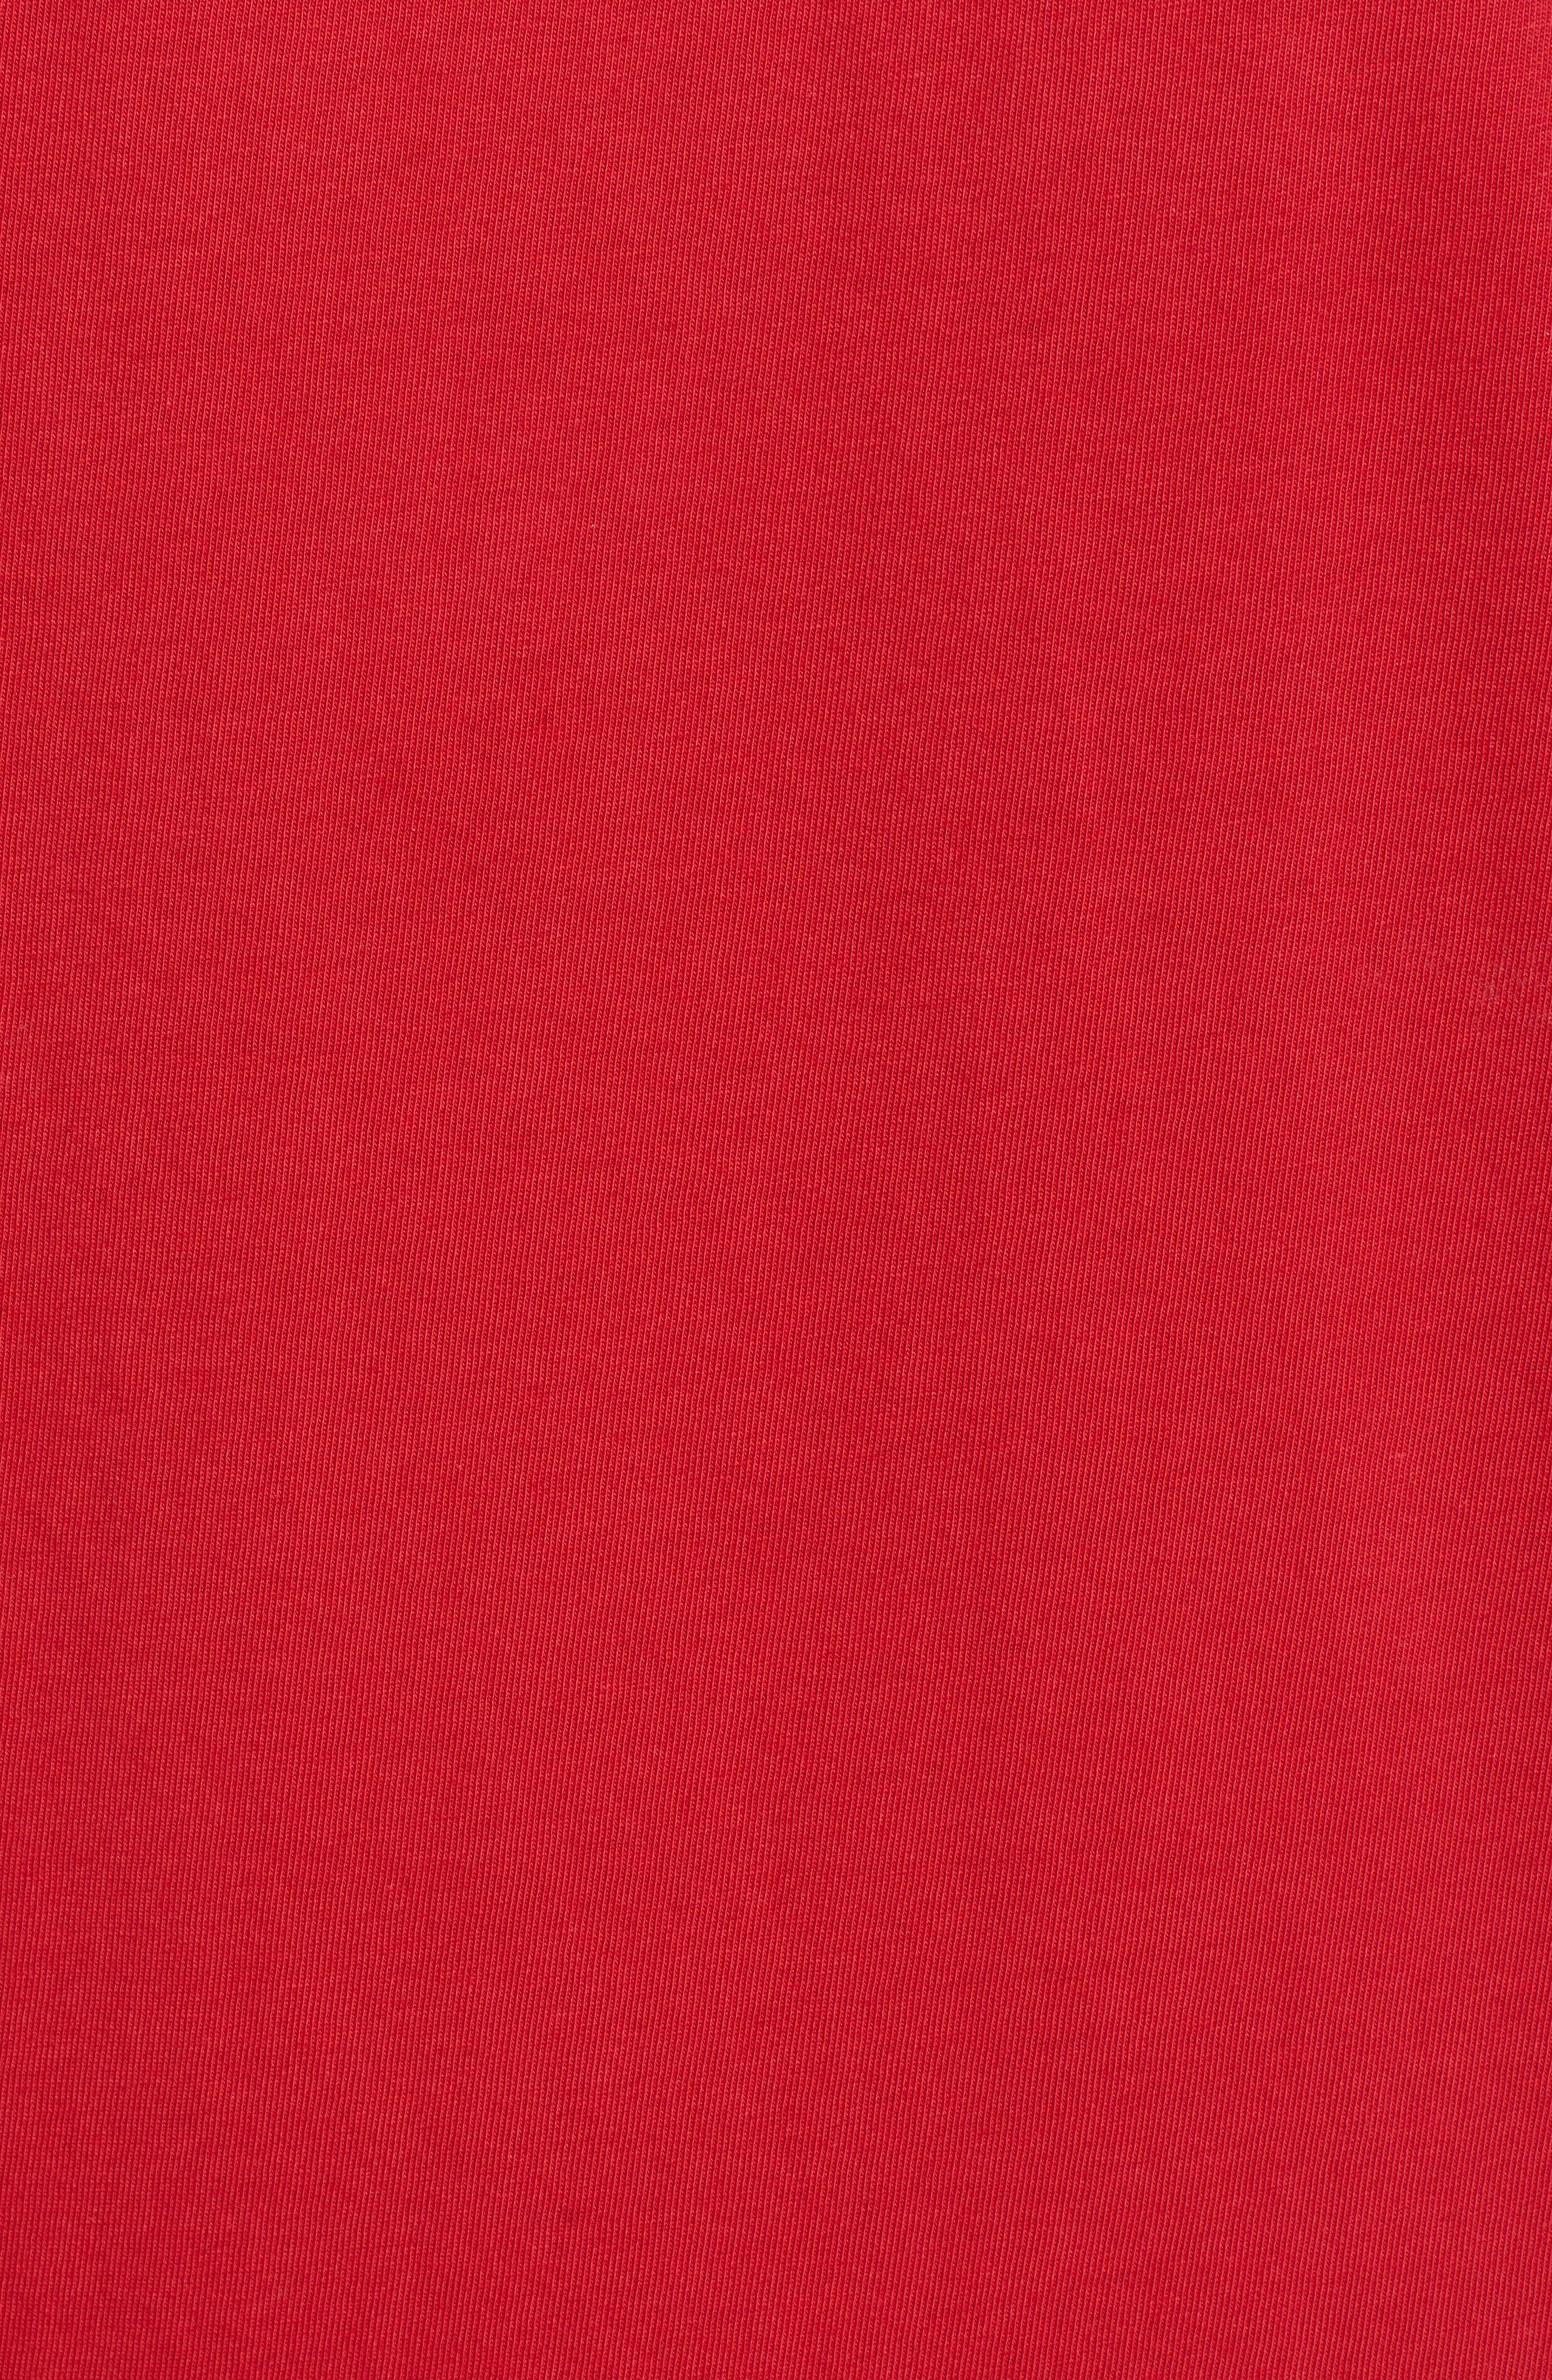 TOMMY BAHAMA, Alo-Ho Ho-Ha Graphic T-Shirt, Alternate thumbnail 5, color, SCOOTER RED